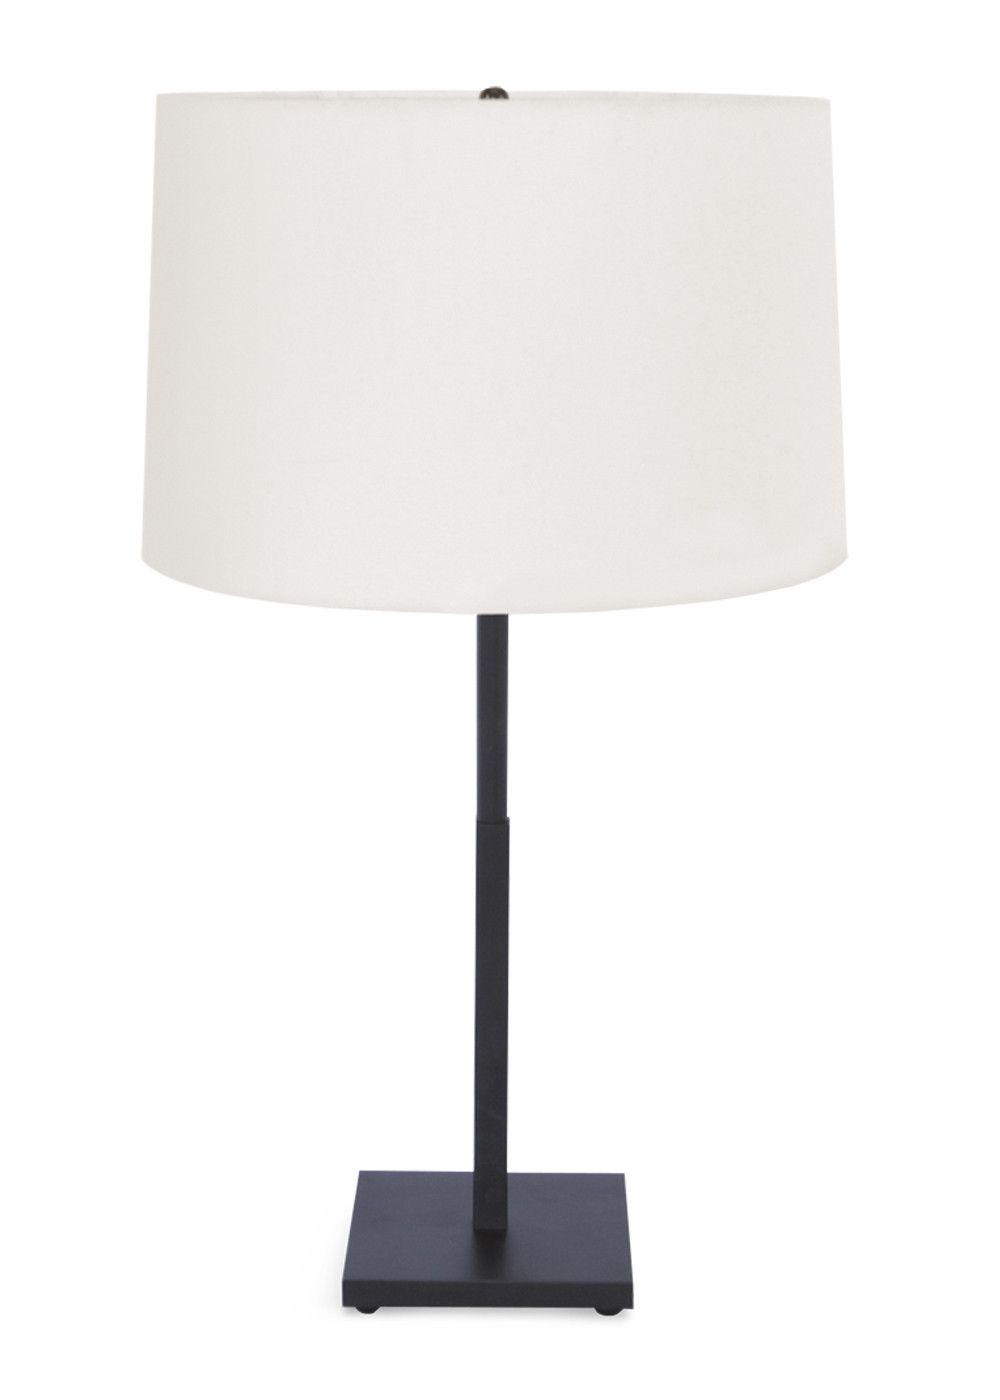 luxury lighting companies. albany table lamp (#t-405e)   df companies #luxurylighting #lighting luxury lighting c